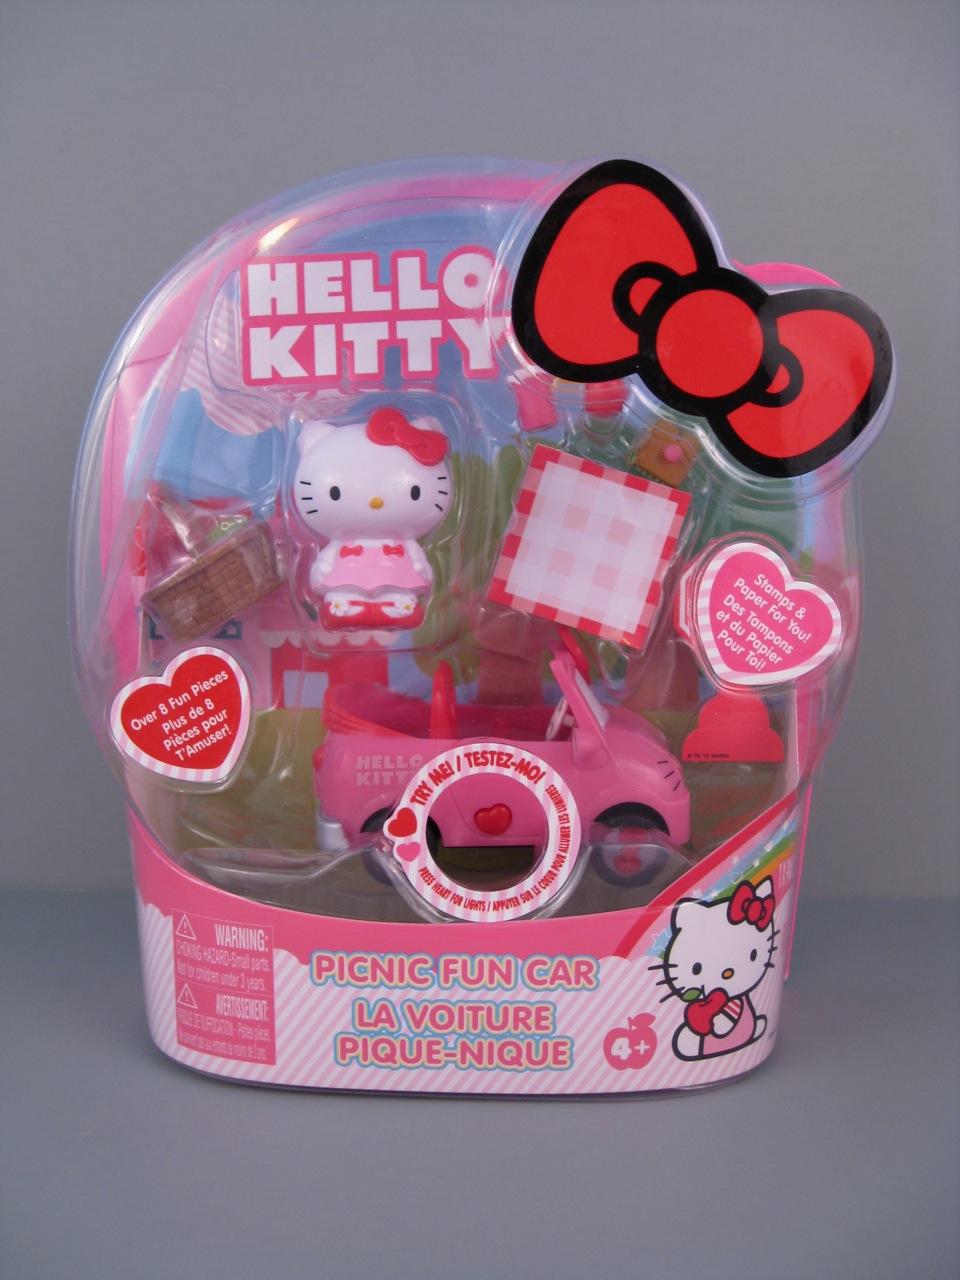 Hello Kitty Toys For Cakes : Hello kitty mini dolls from jada toys and blip the